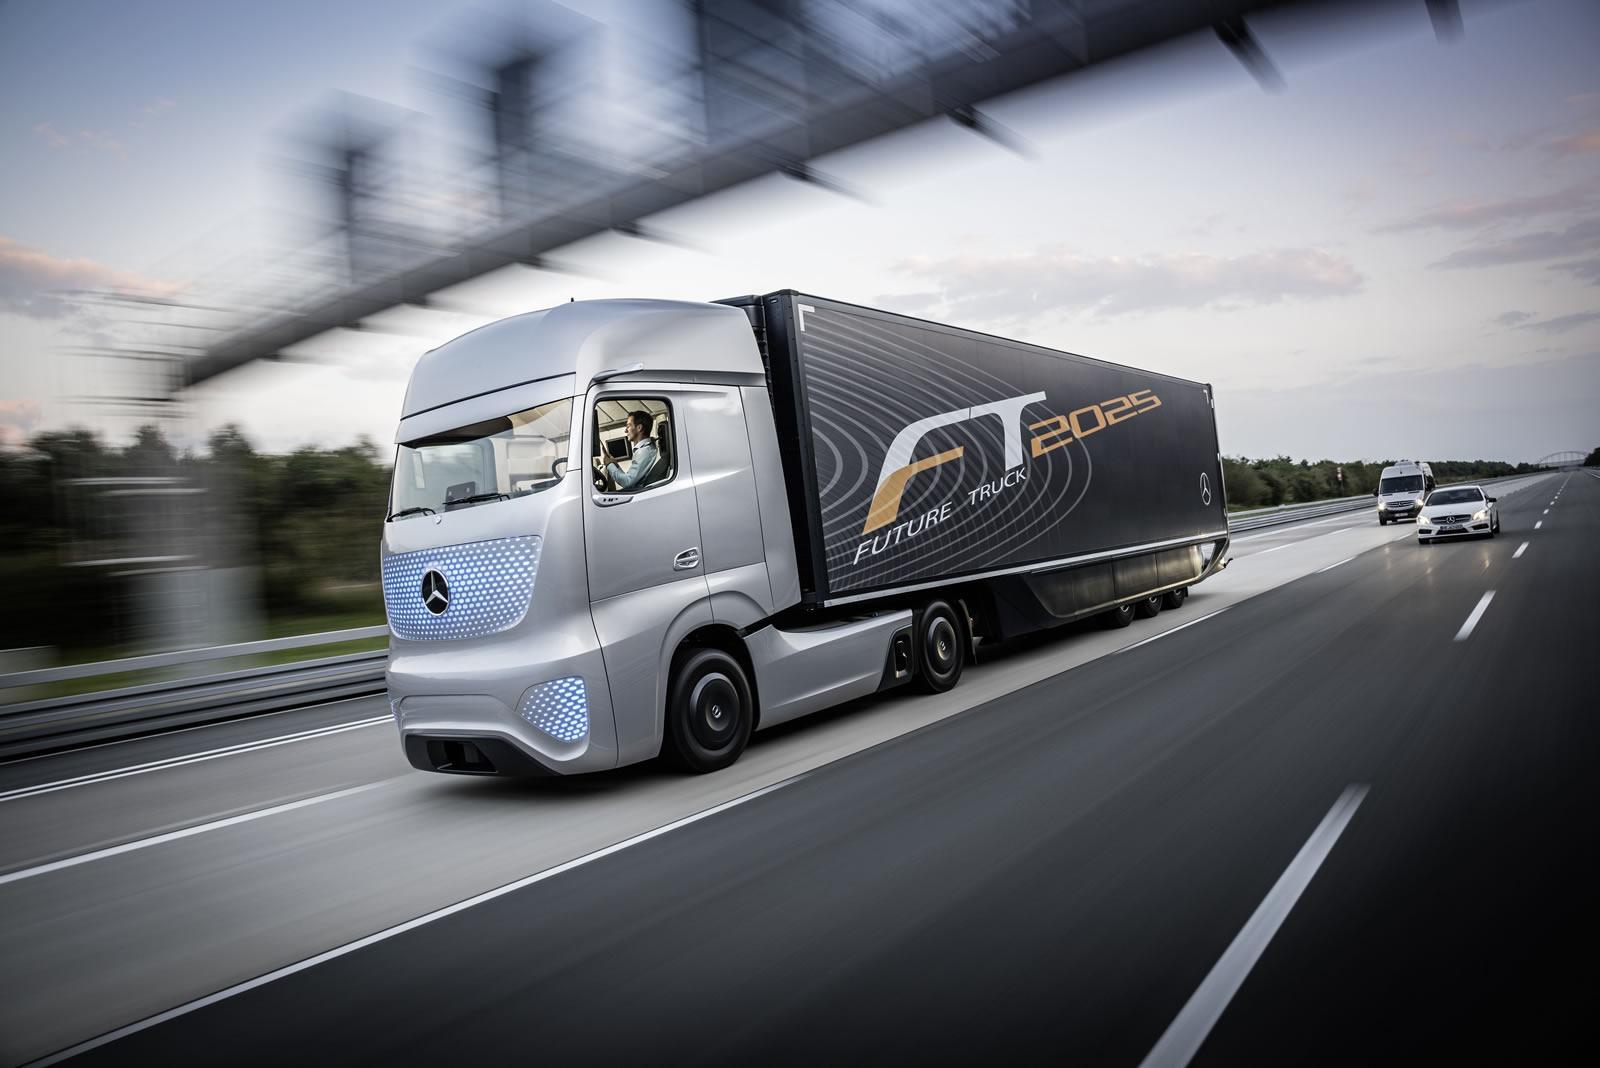 Mercedes benz unveils future truck 2025 video for Mercedes benz service plan